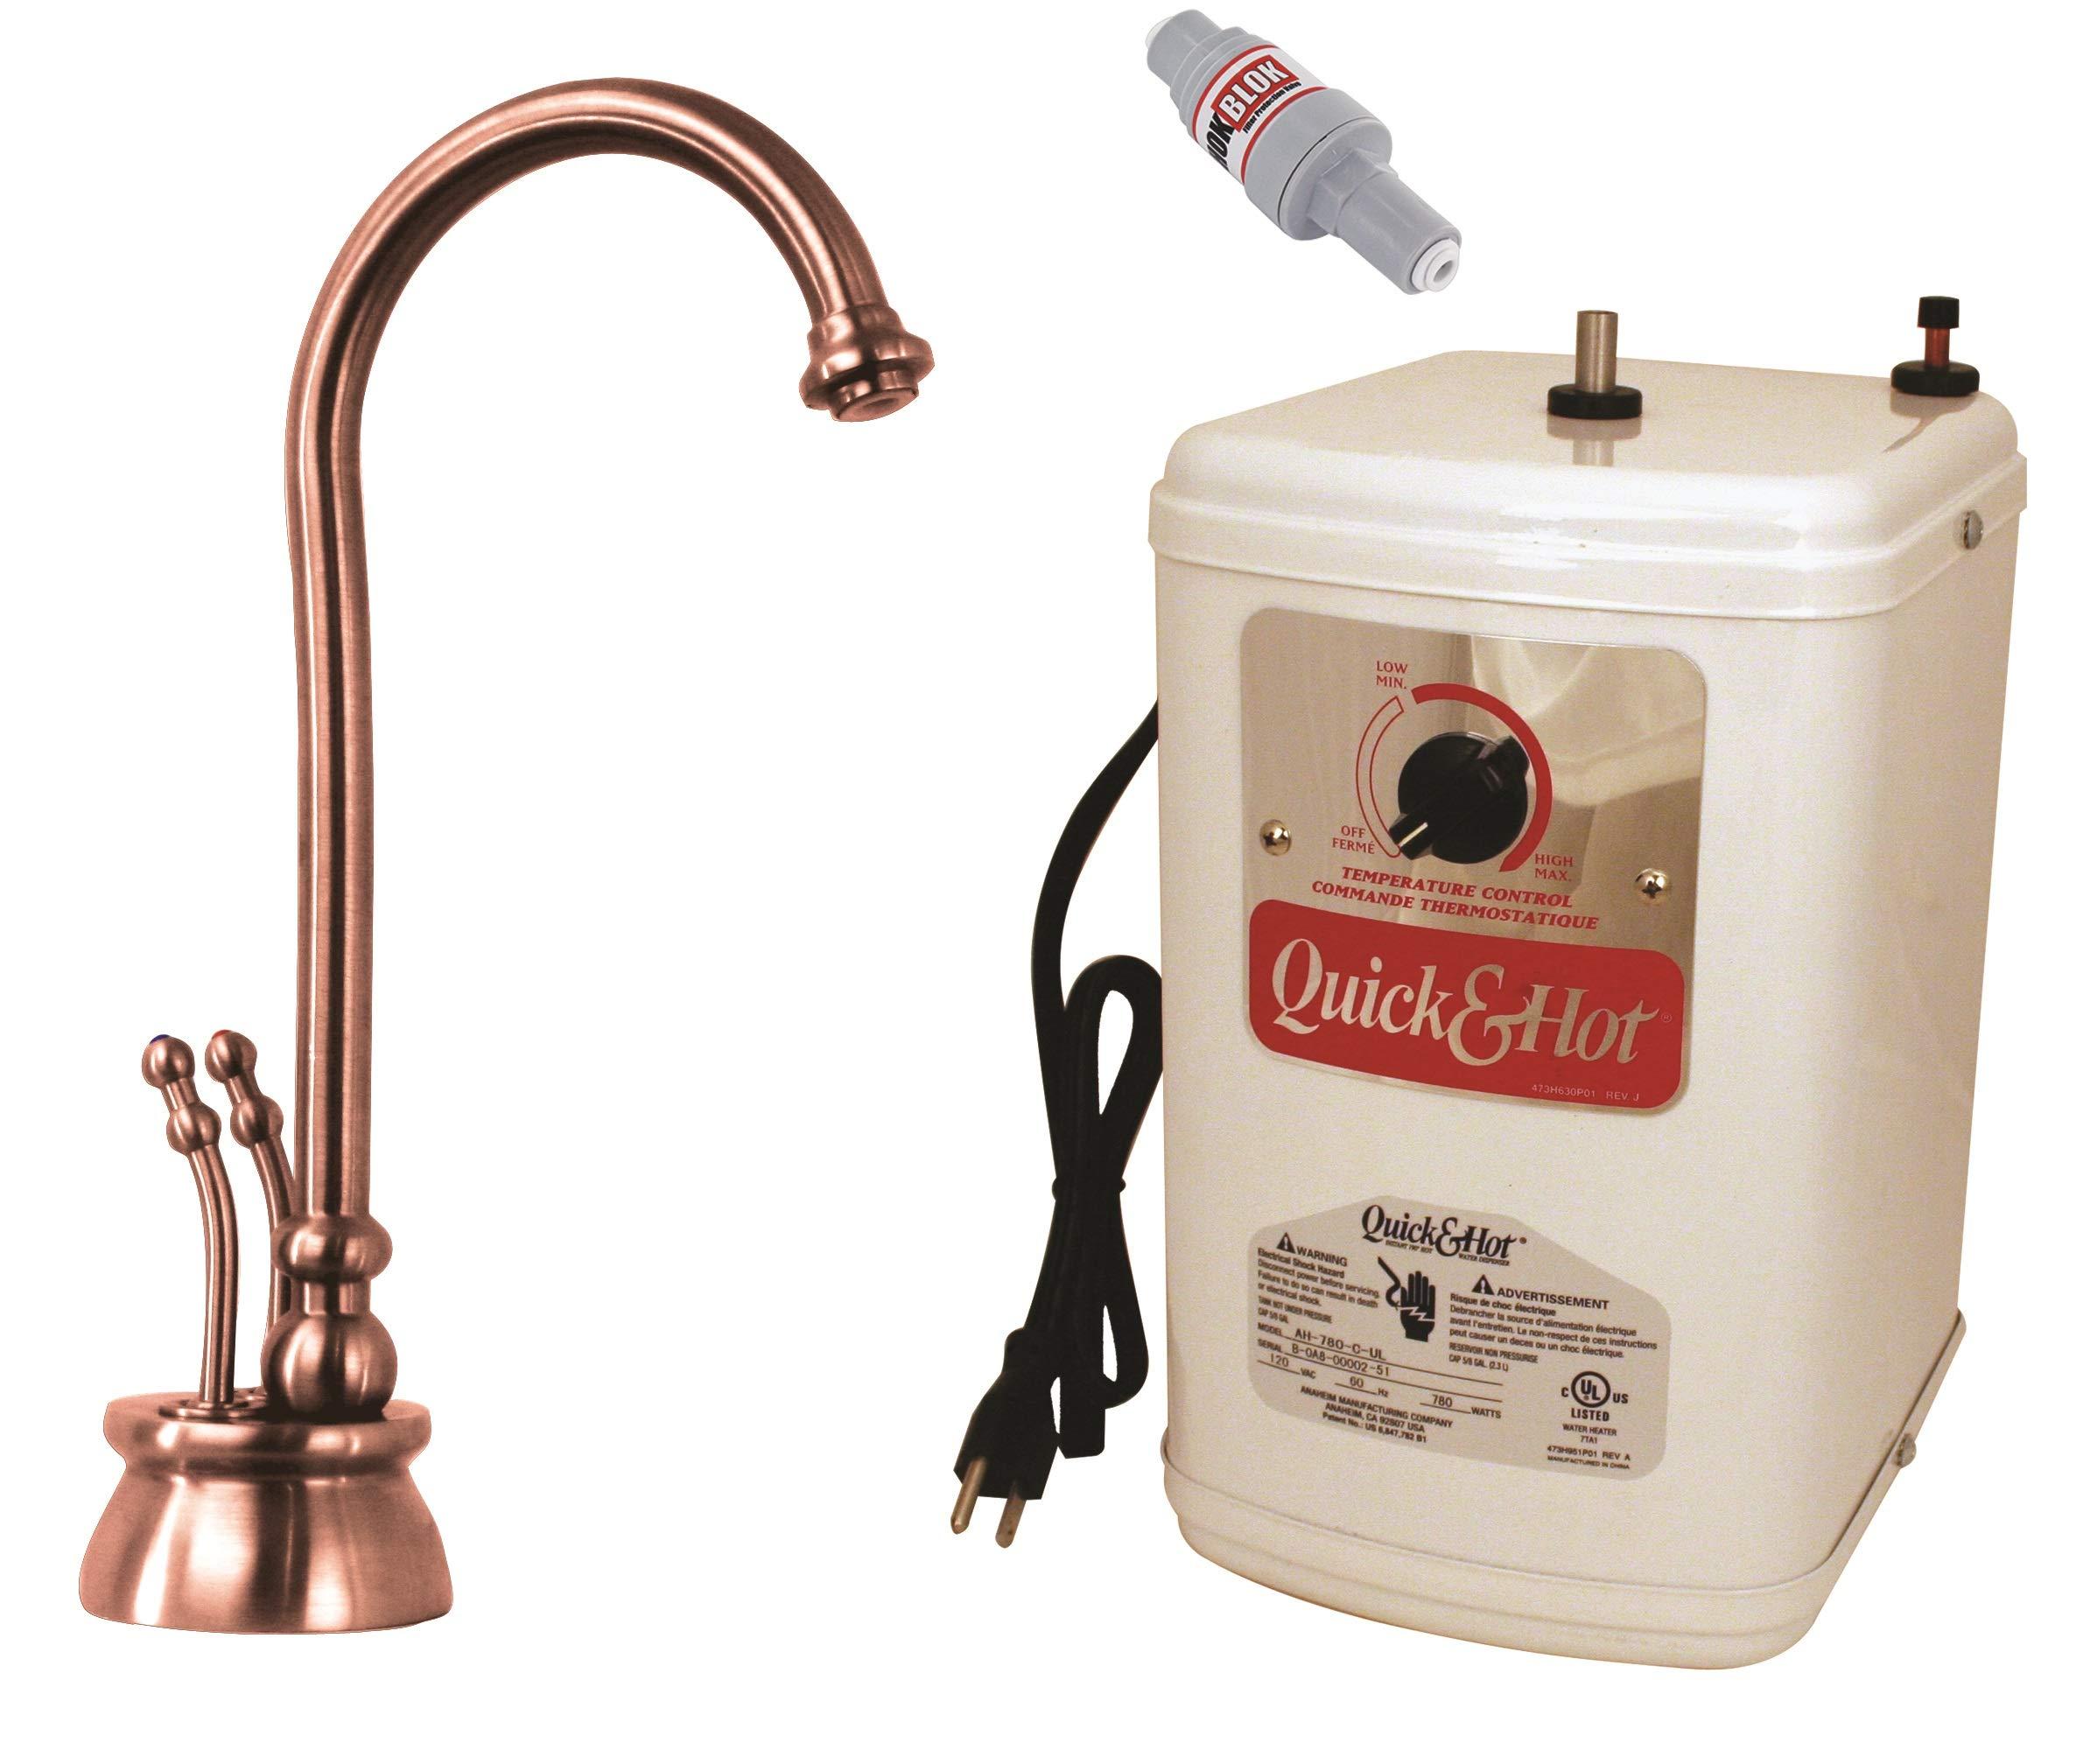 Westbrass D262H-11 Docalorah Hot-Cold Water Dispenser Kit - Antique Copper